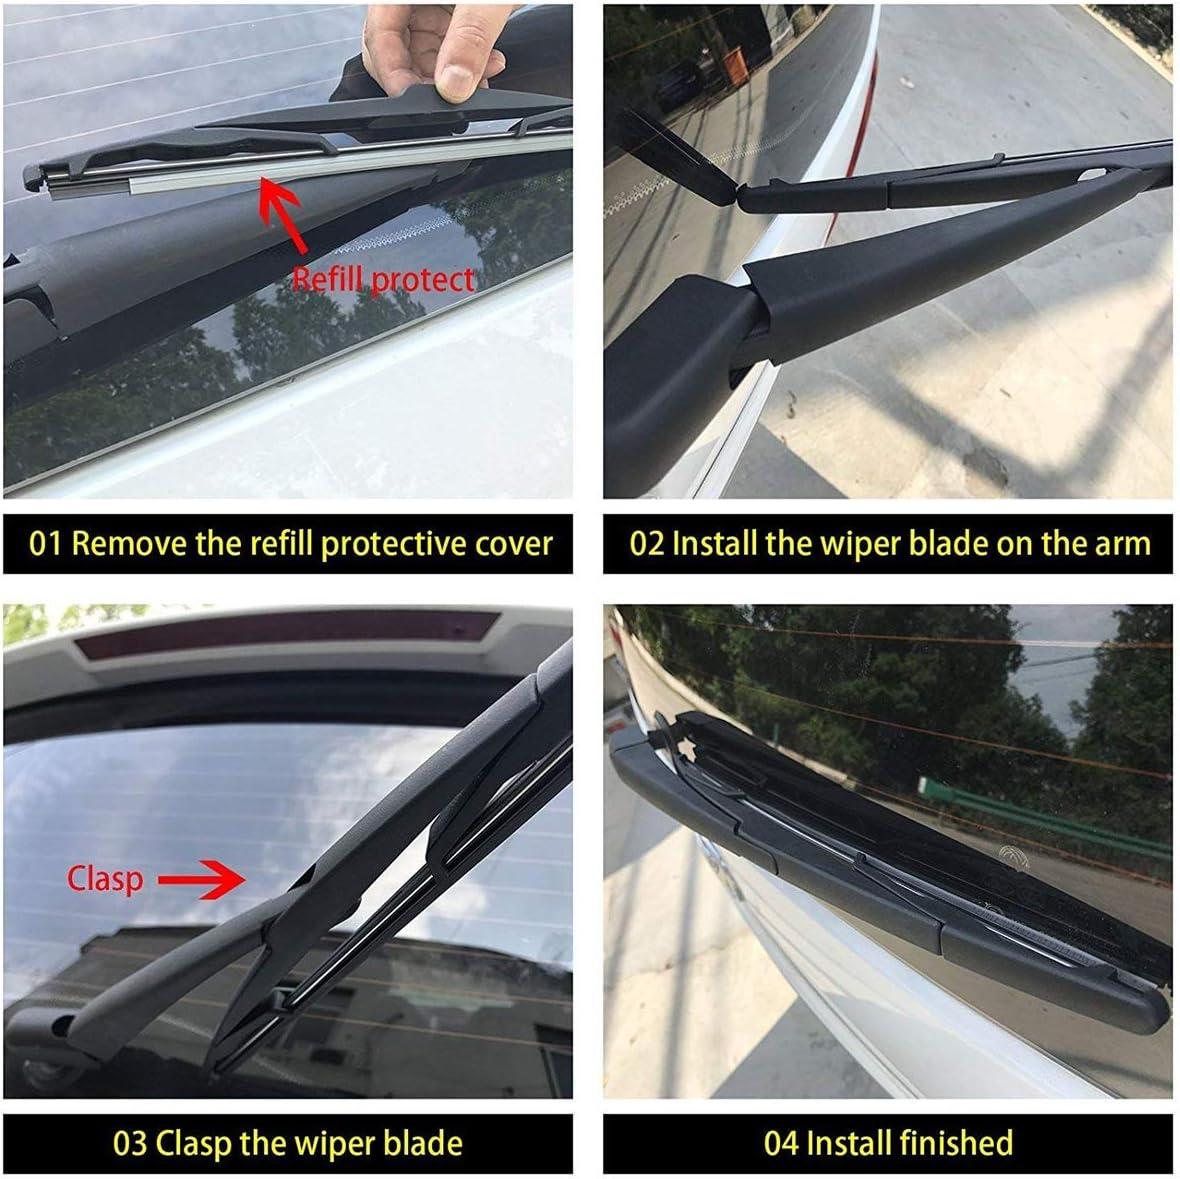 AUTVAN Rear Windsheild Back Wiper Arm and Blade Kit for Jeep Grand Cherokee 2011-2013 Toyota Land Cruiser Lexus LX570 2008-2015 GX470 2003-2009 OE 68040371A Arm Rear Wiper 68079868AA// 85241-42070